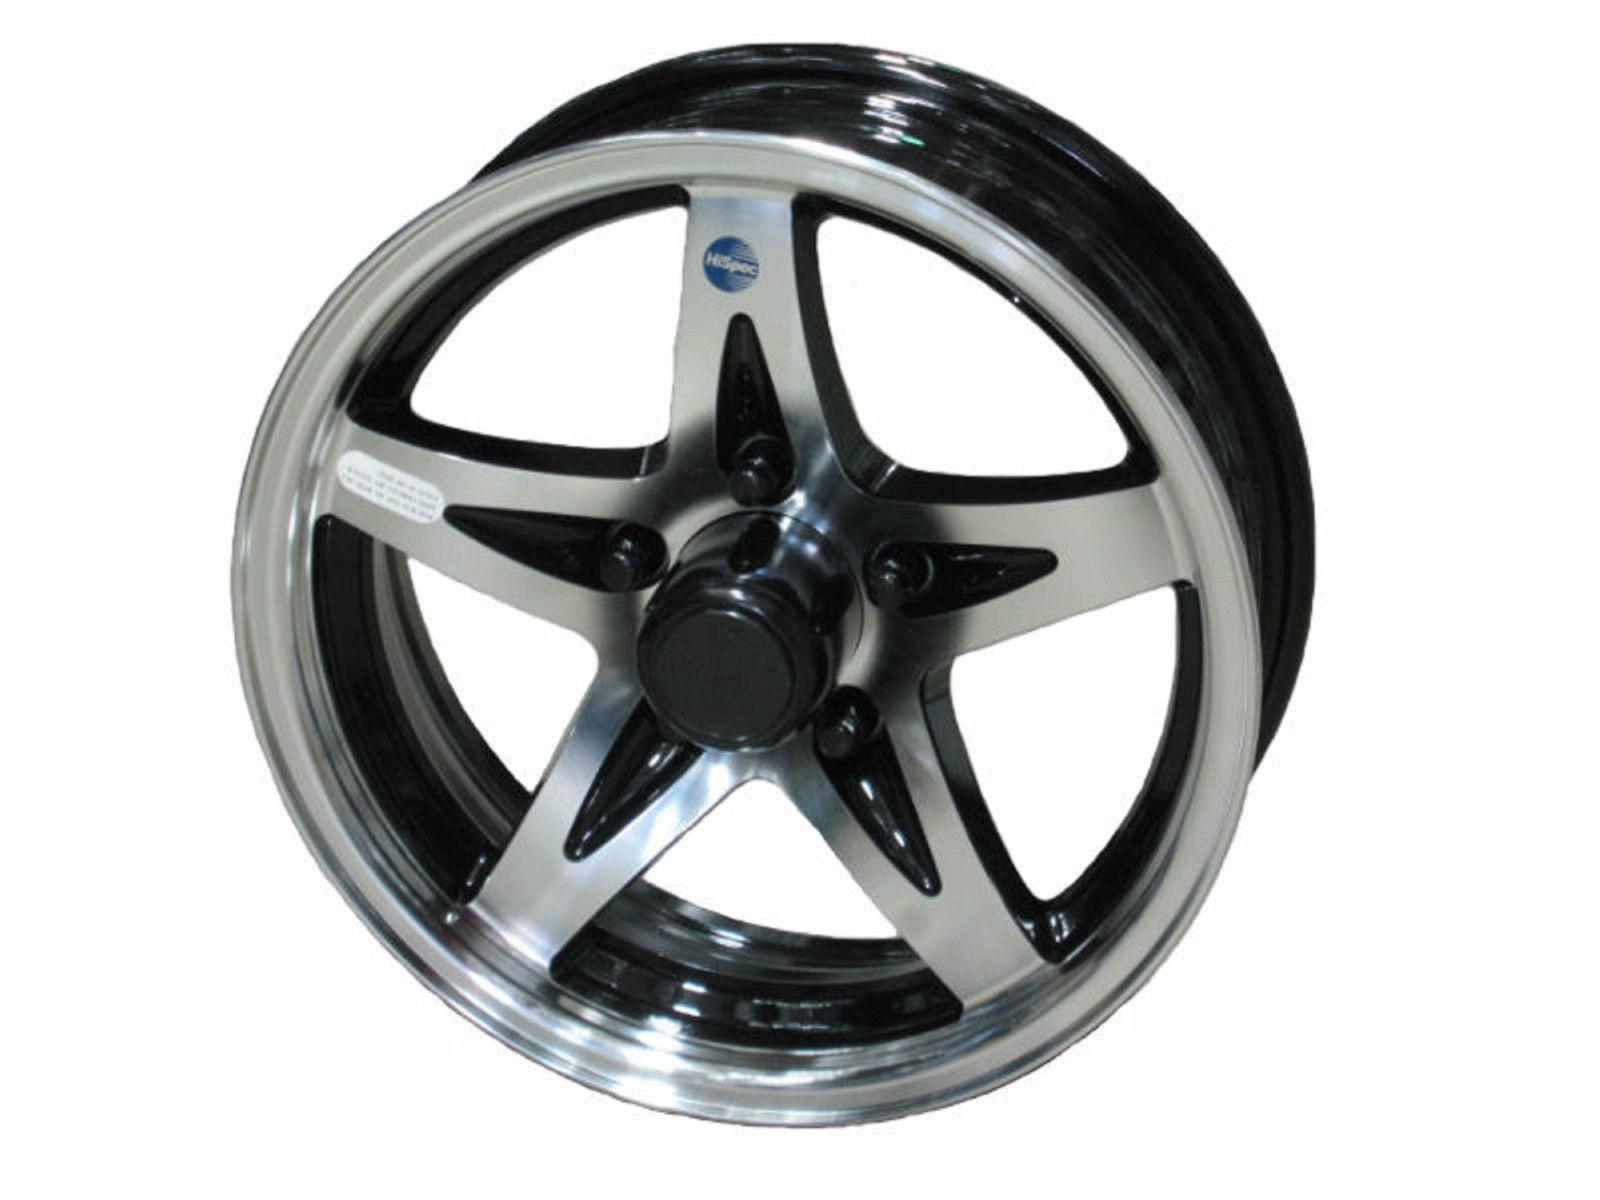 "15"" 5 Lug Series 14 Black Hispec Aluminum Trailer Wheel bbb camper rv utility"